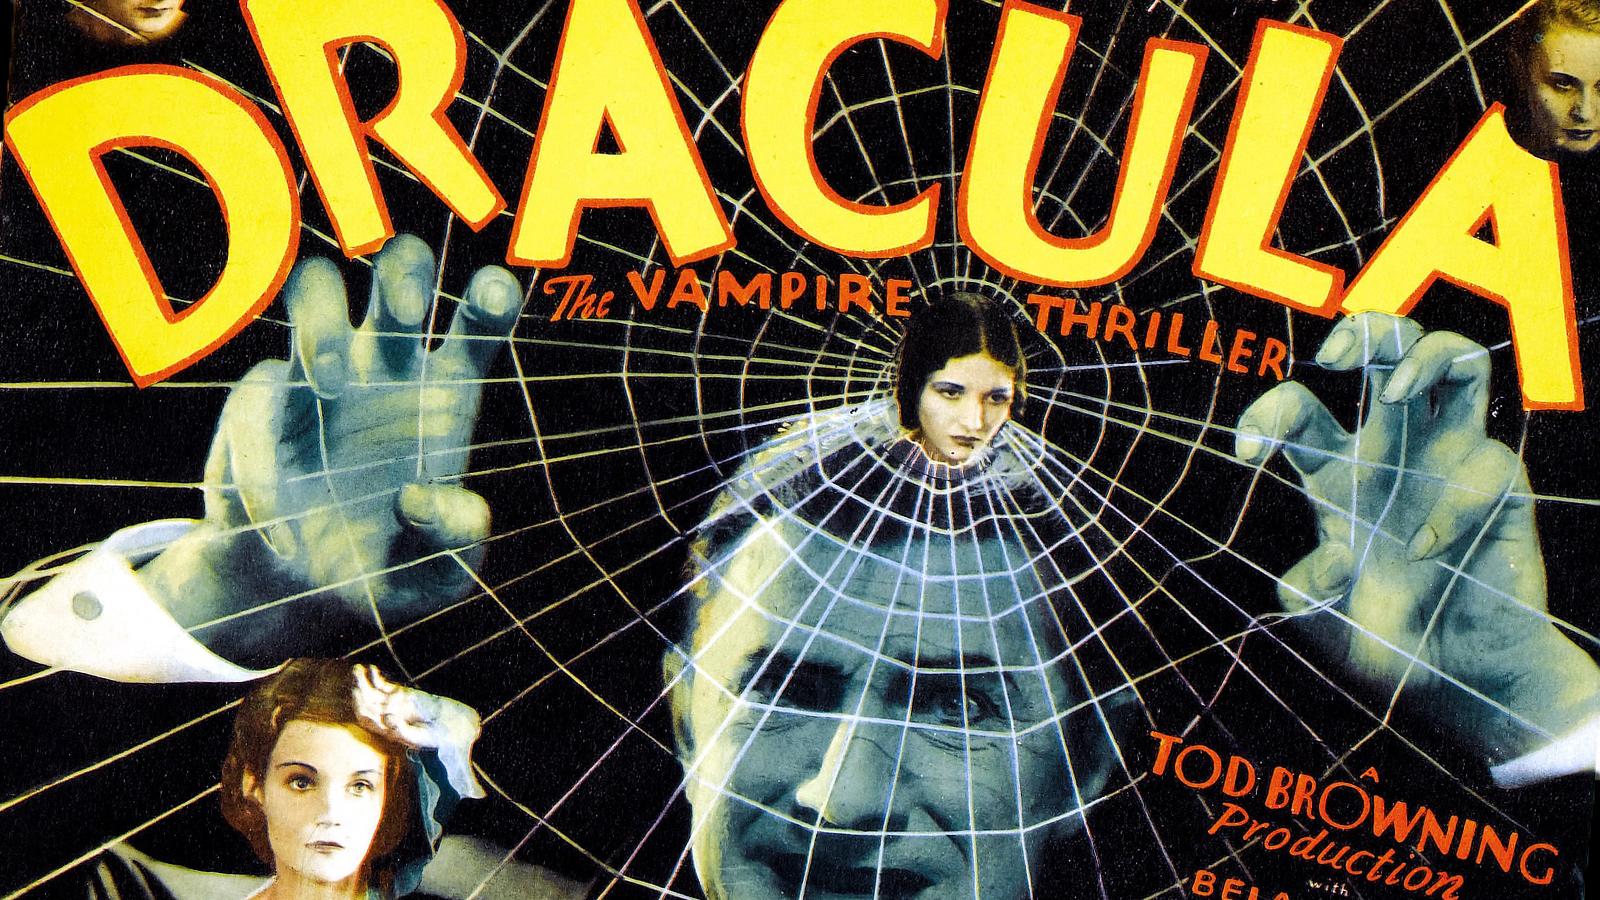 Dracula: vampires, perversity and Victorian anxieties